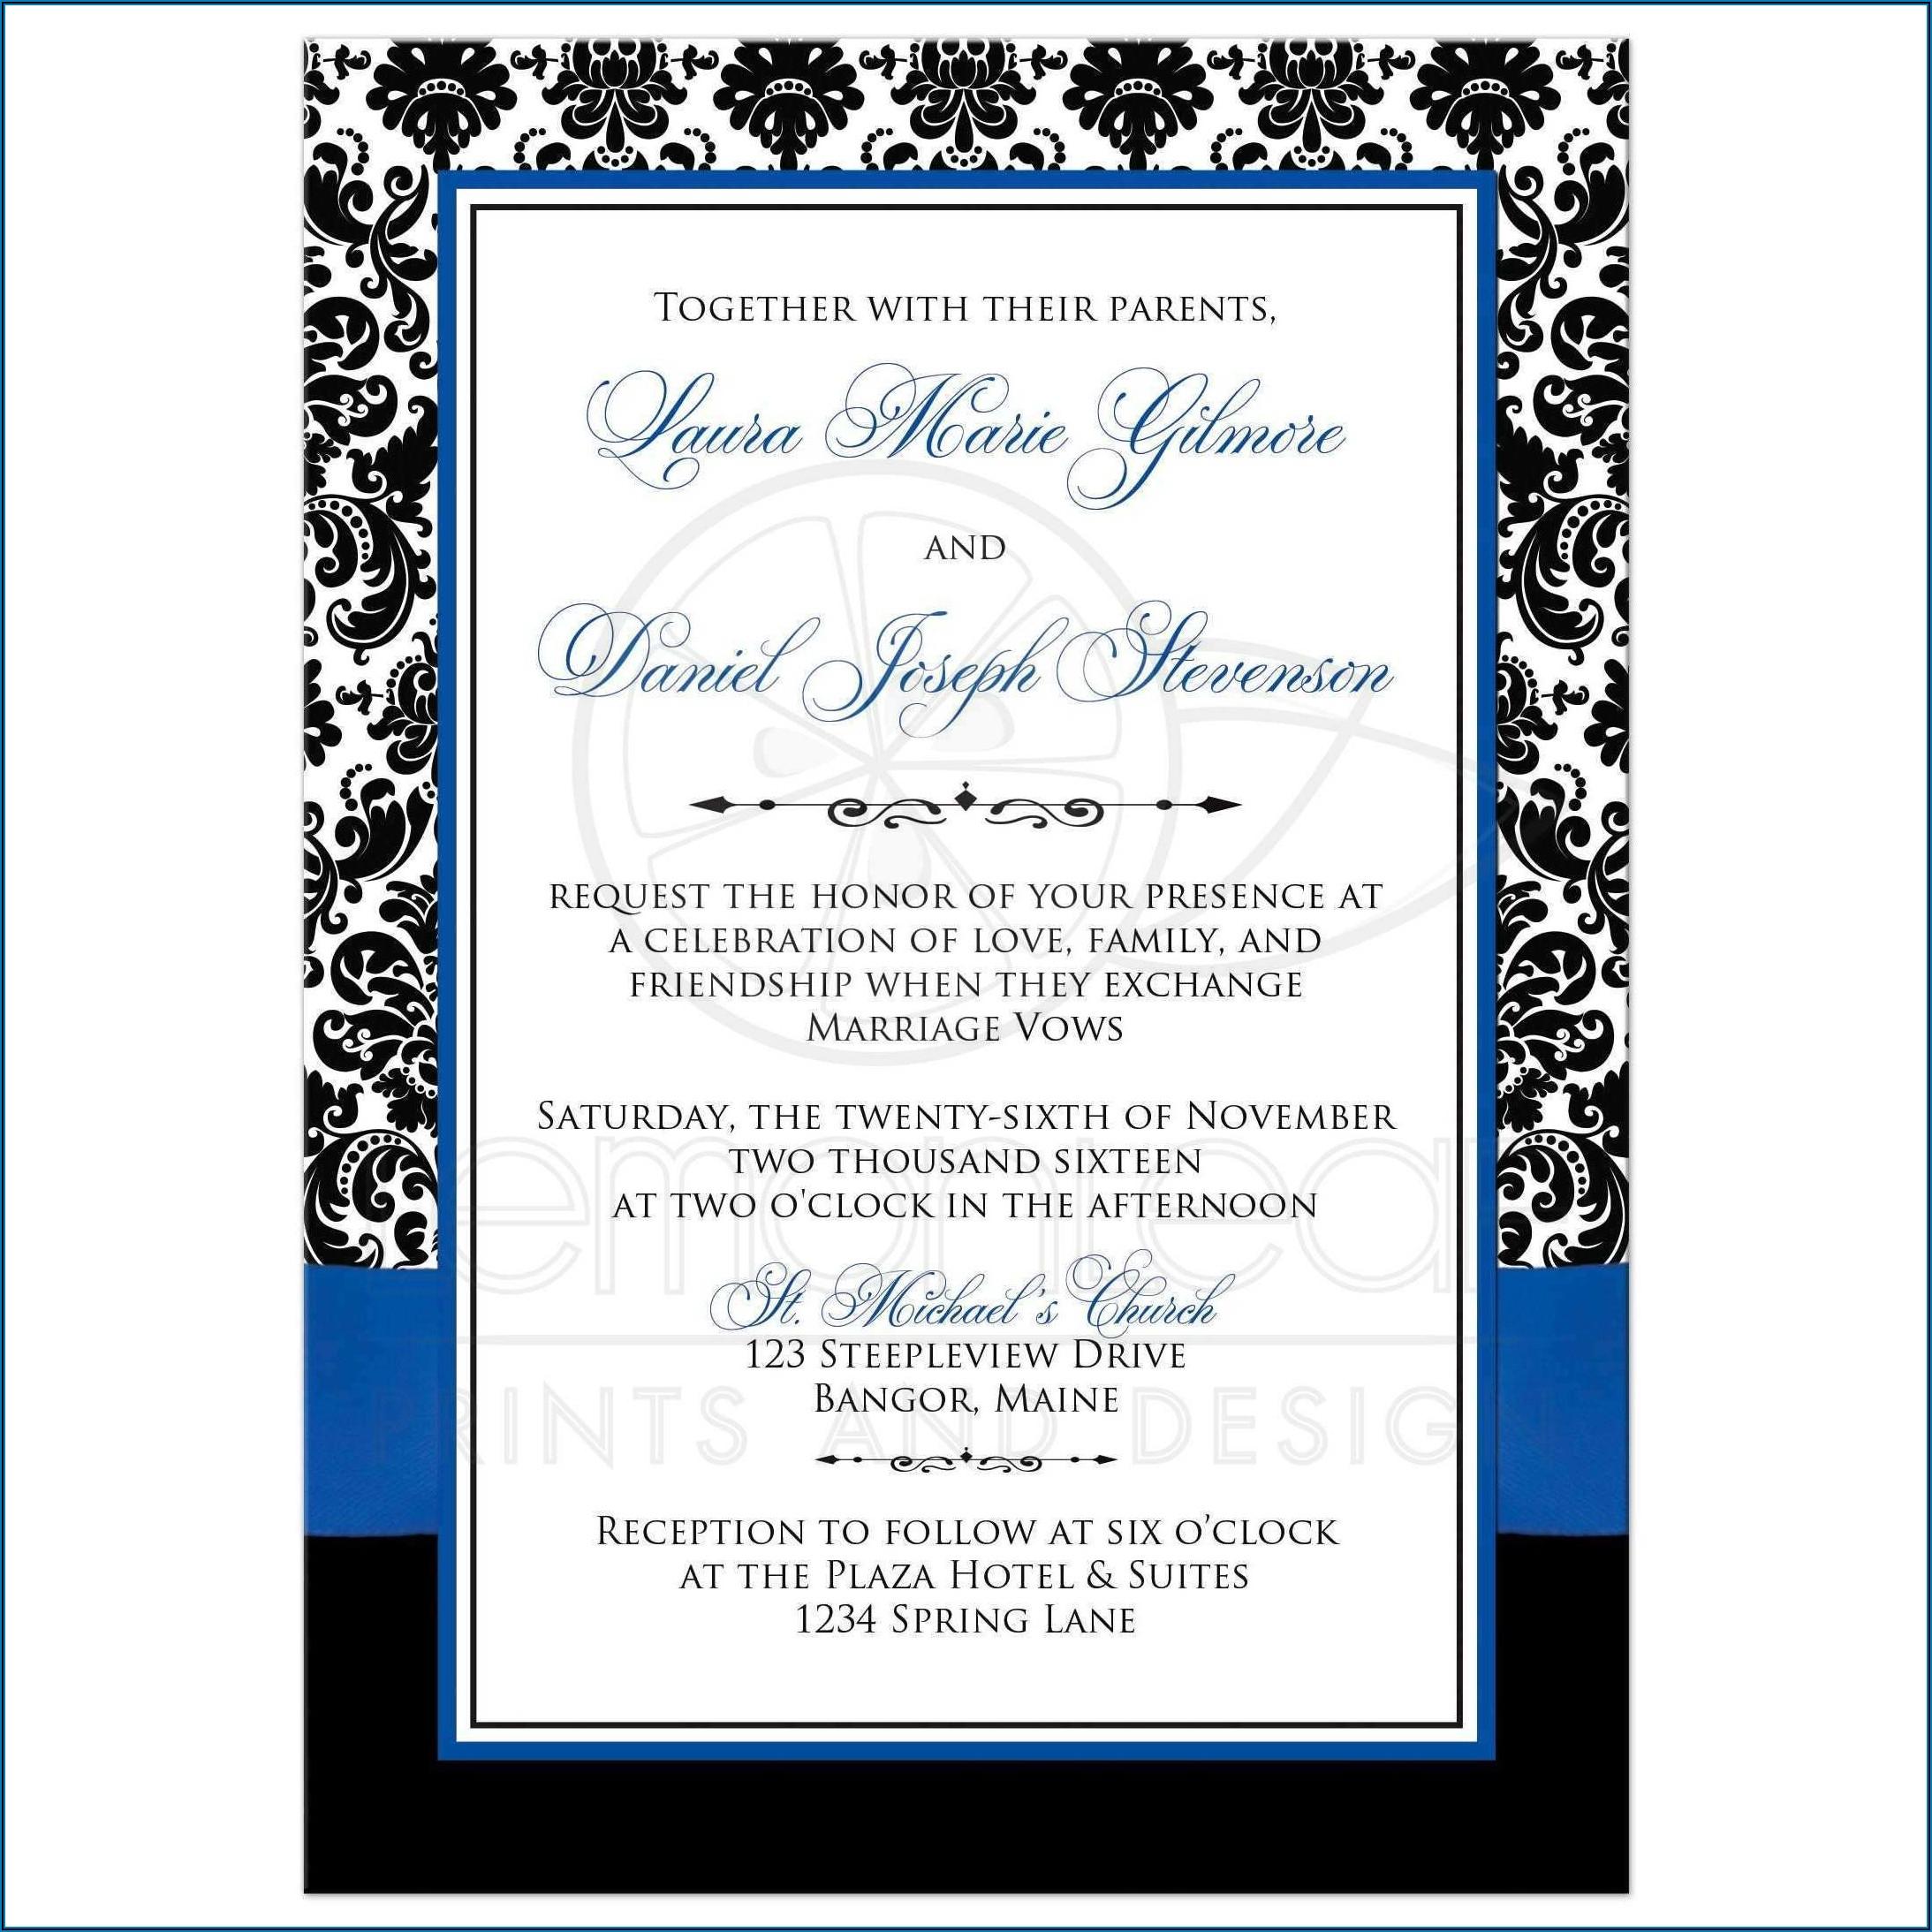 Invitation Cards Templates Online